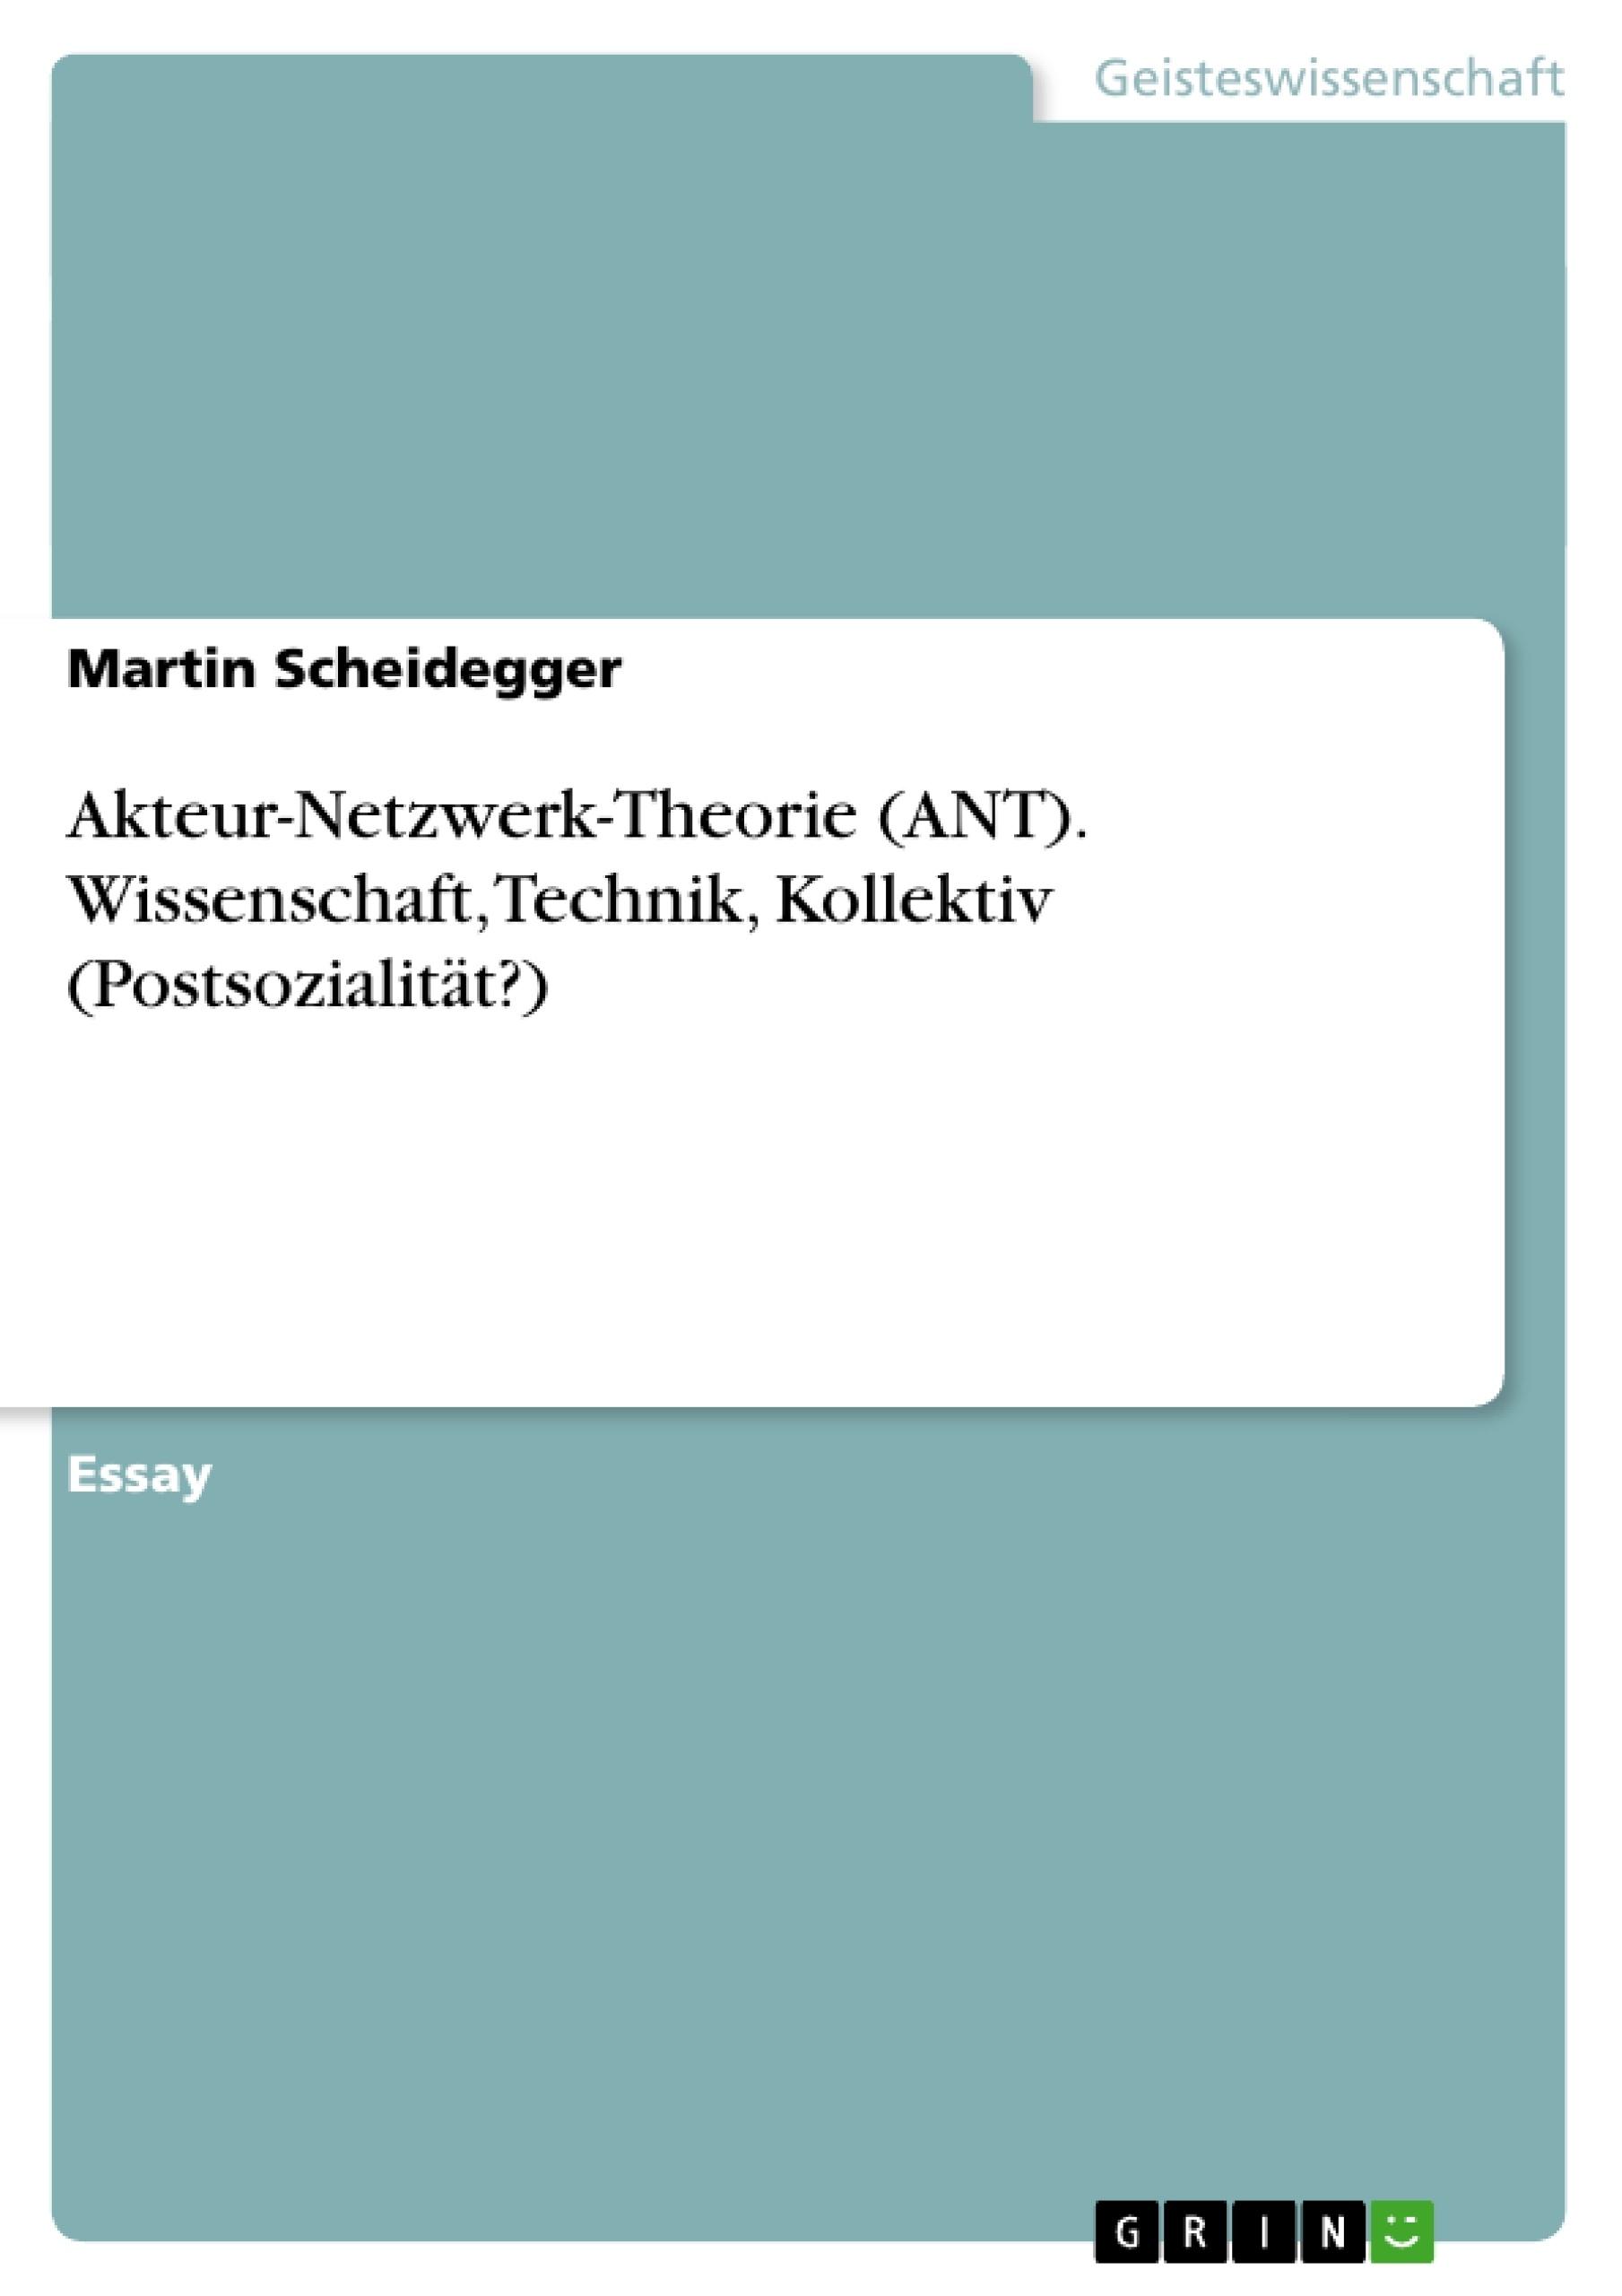 Titel: Akteur-Netzwerk-Theorie (ANT). Wissenschaft, Technik, Kollektiv (Postsozialität?)